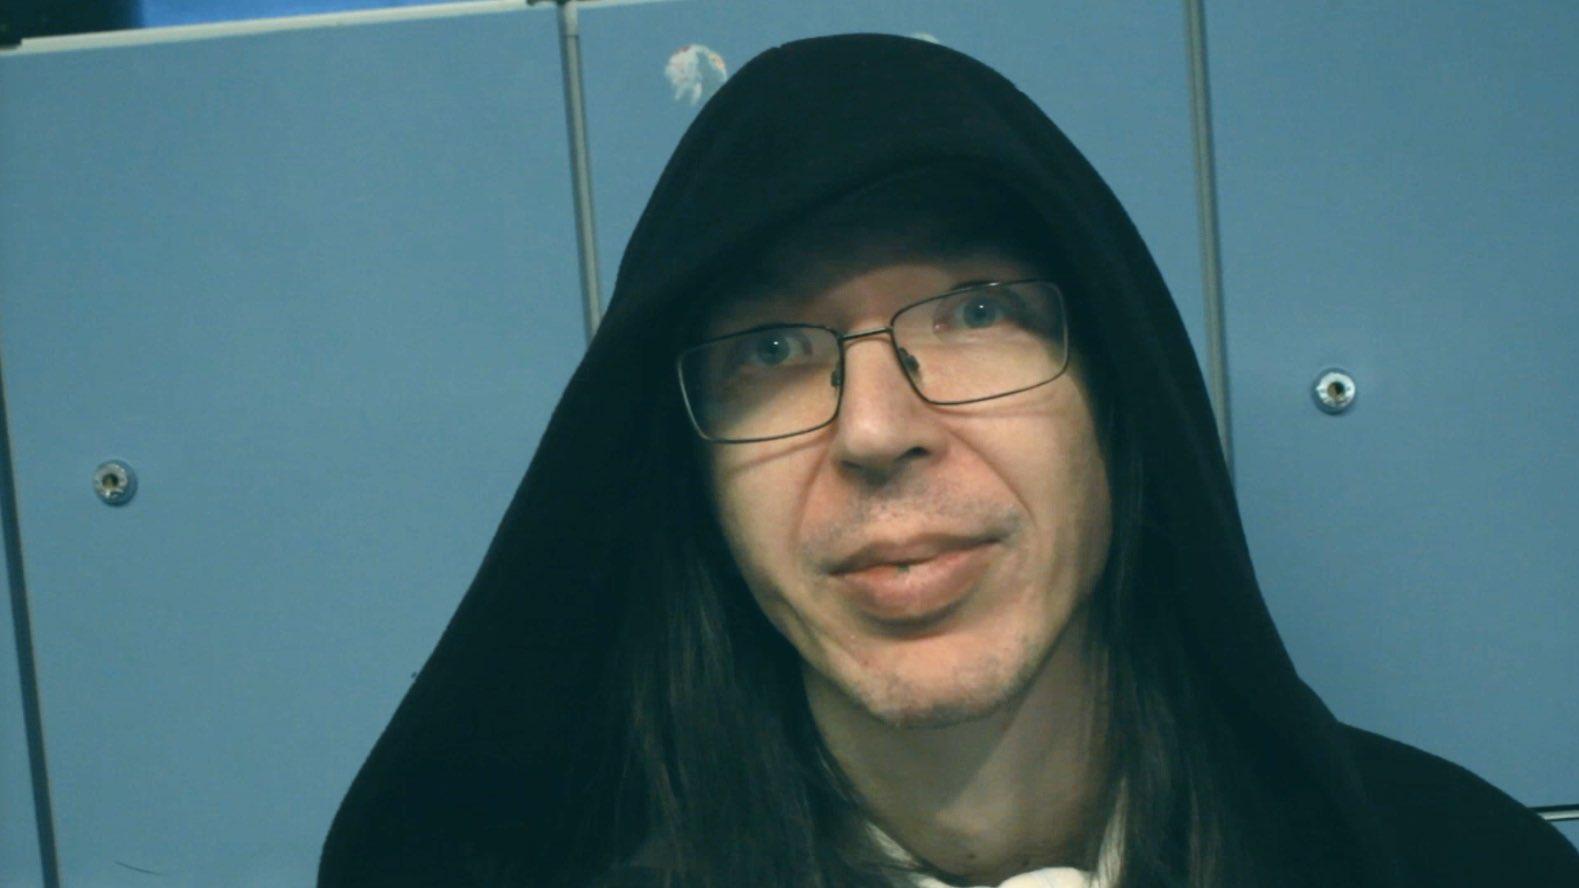 Jedin tie – haastattelussa Kars Skywalker